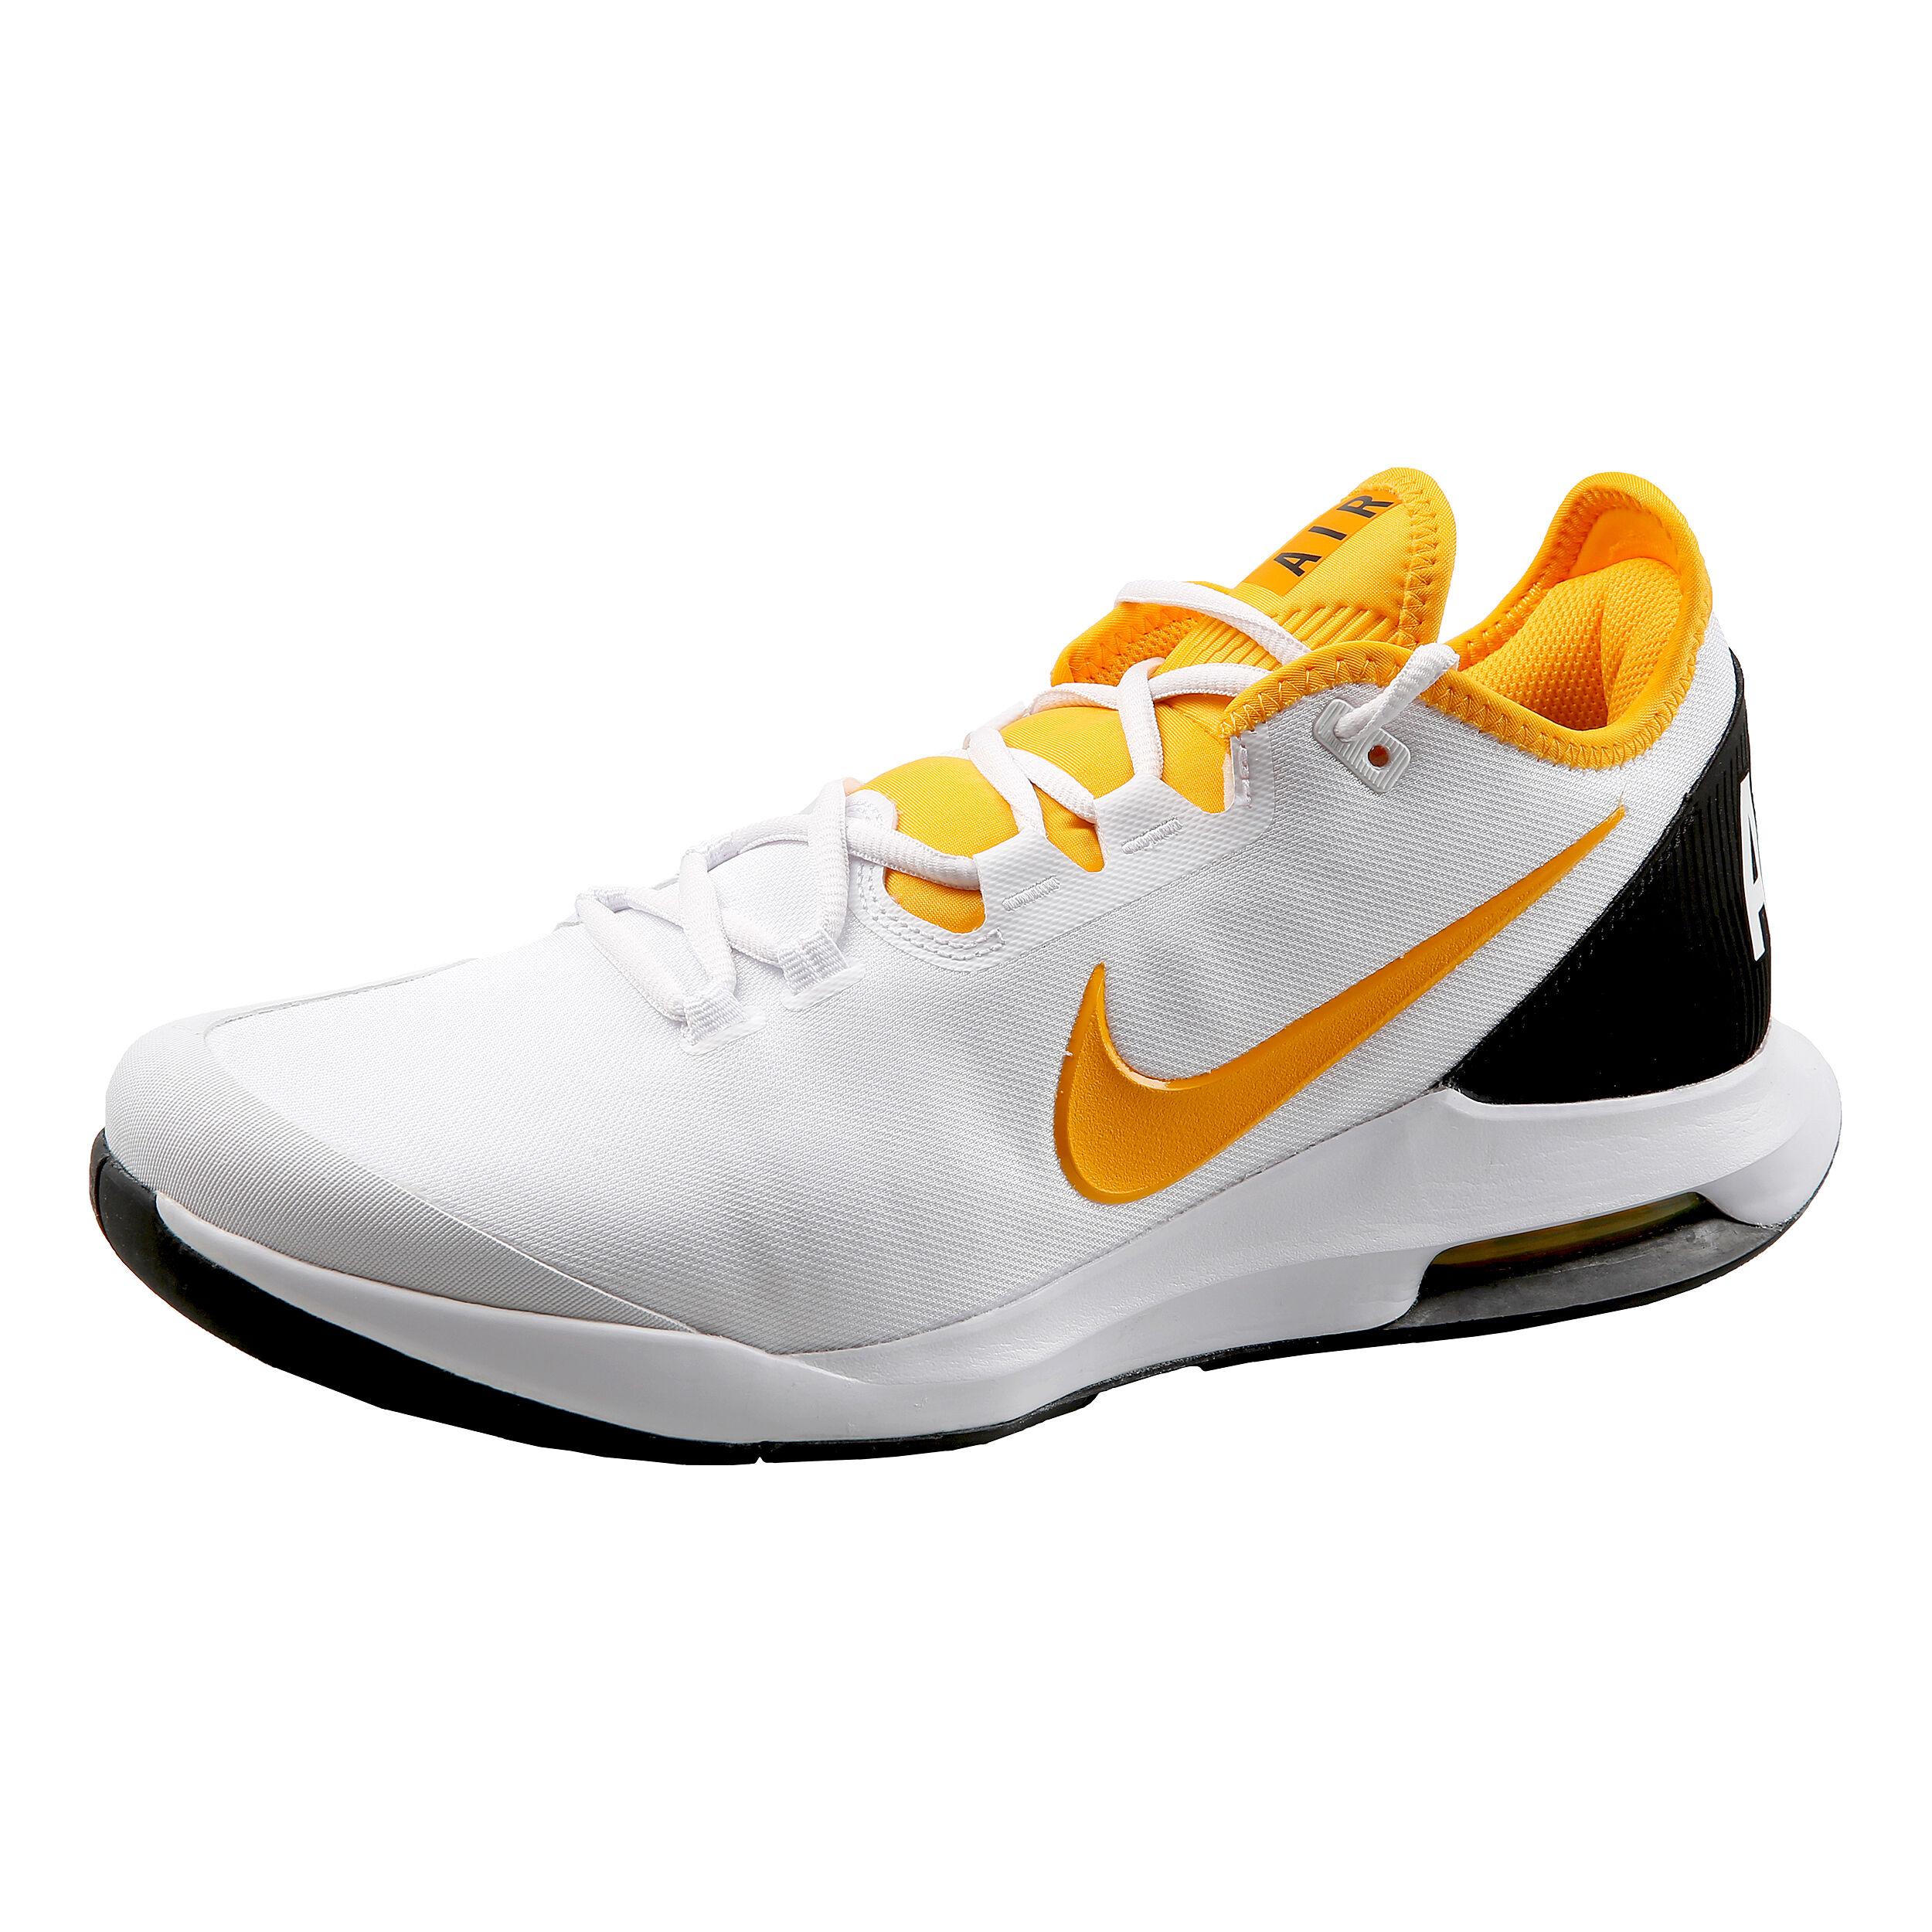 Nike Air Max Wildcard Chaussures Toutes Surfaces Hommes